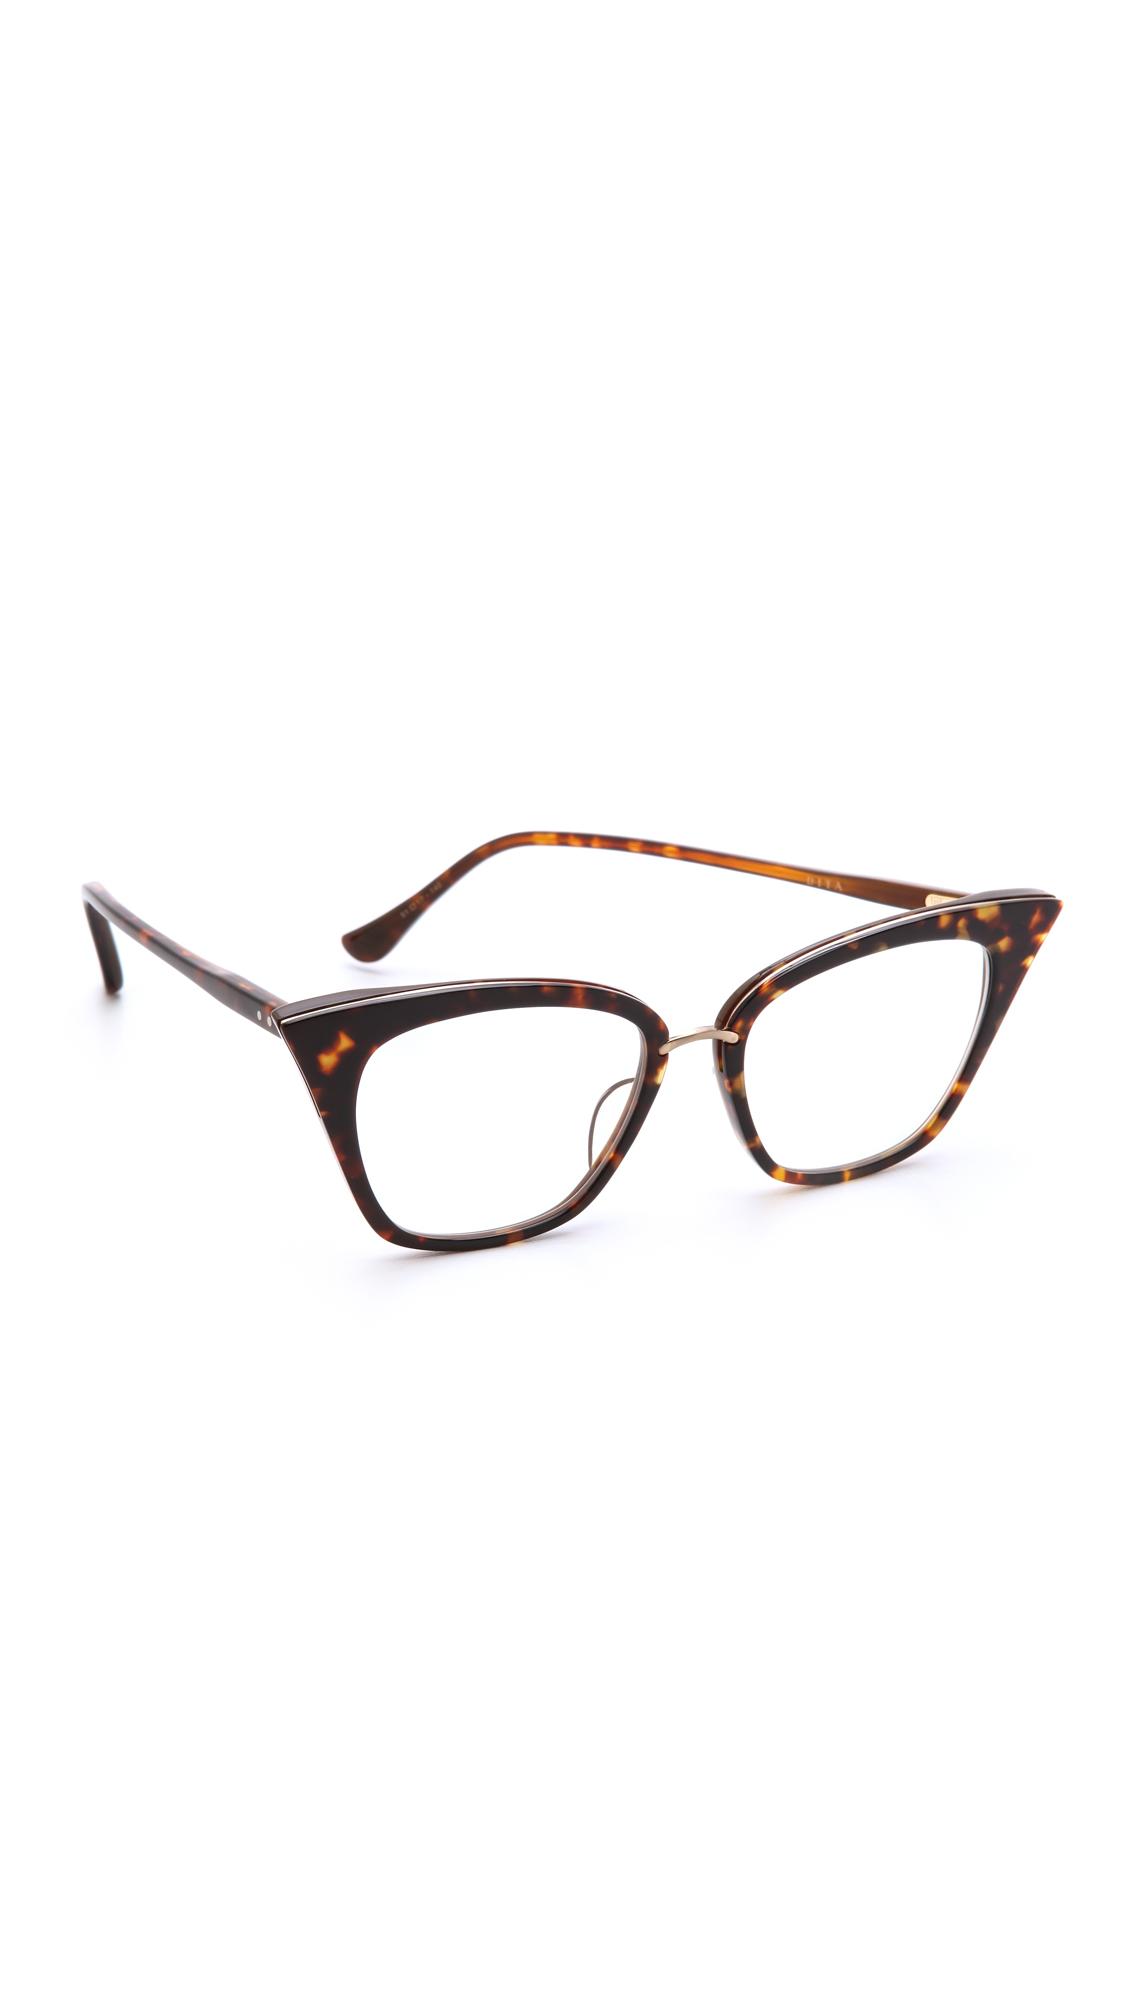 503c4d1b2f8 DITA Rebella Glasses on PopScreen